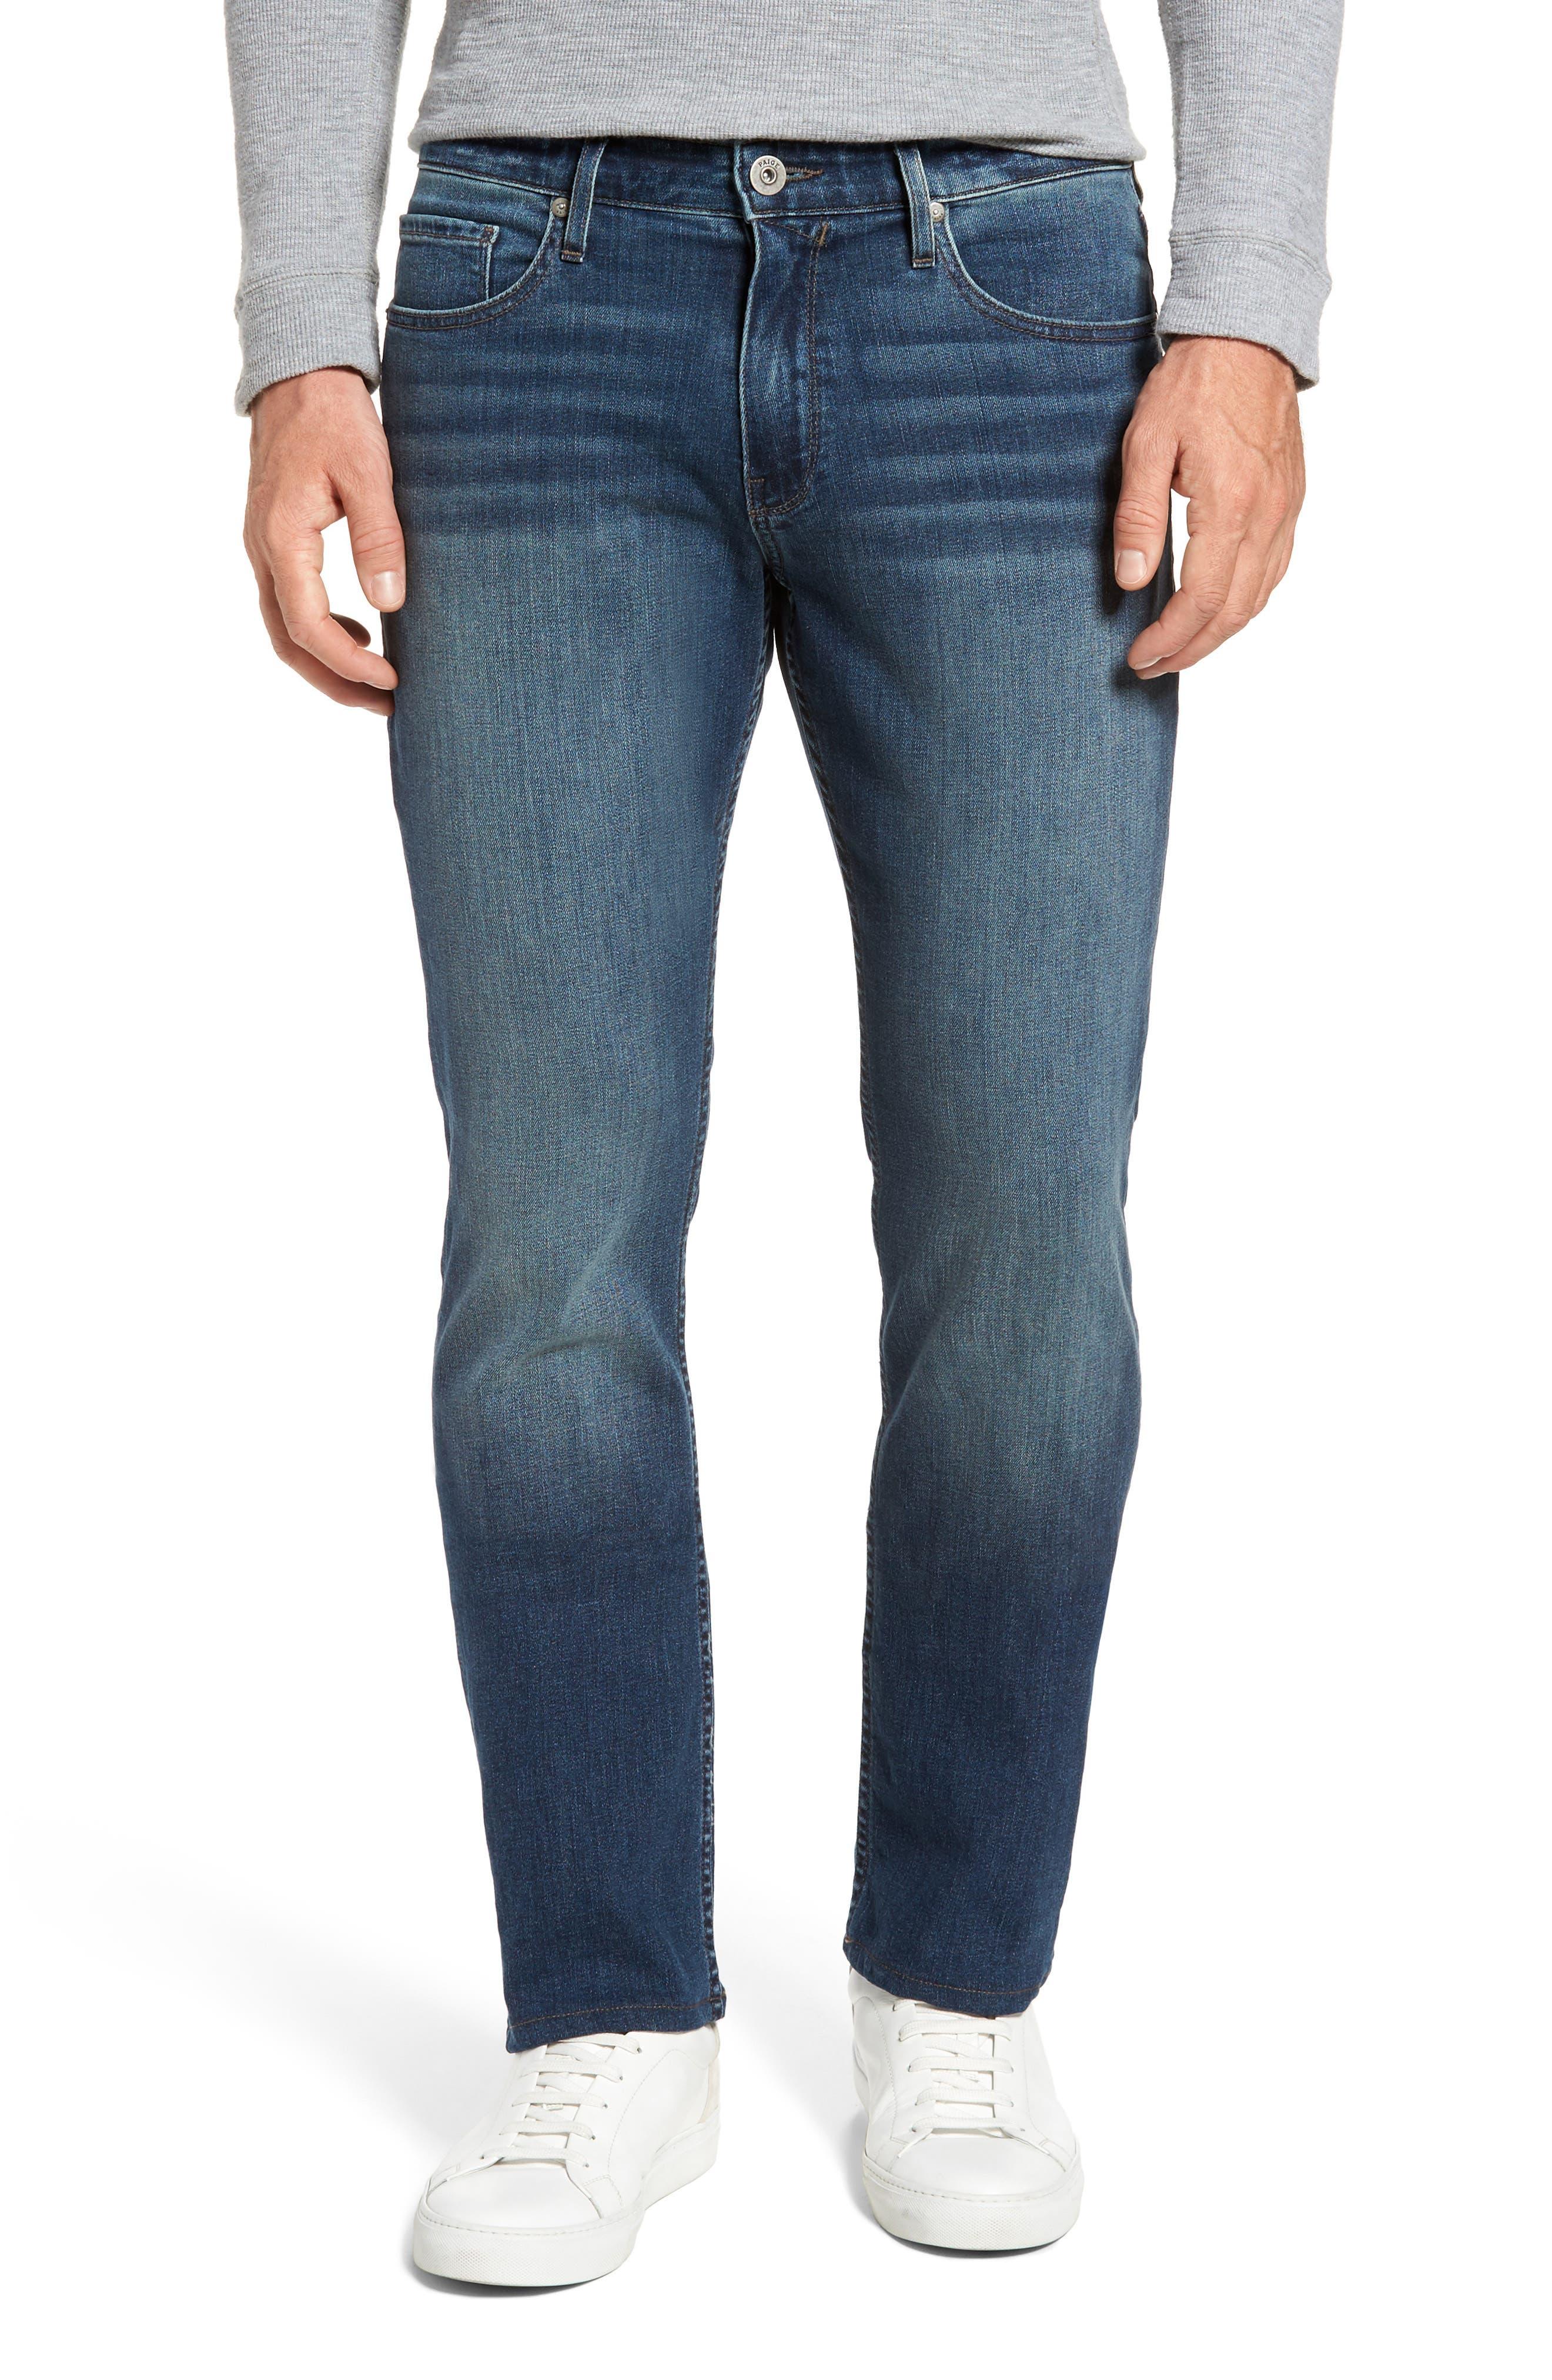 Legacy - Normandie Straight Leg Jeans,                         Main,                         color, Ewan